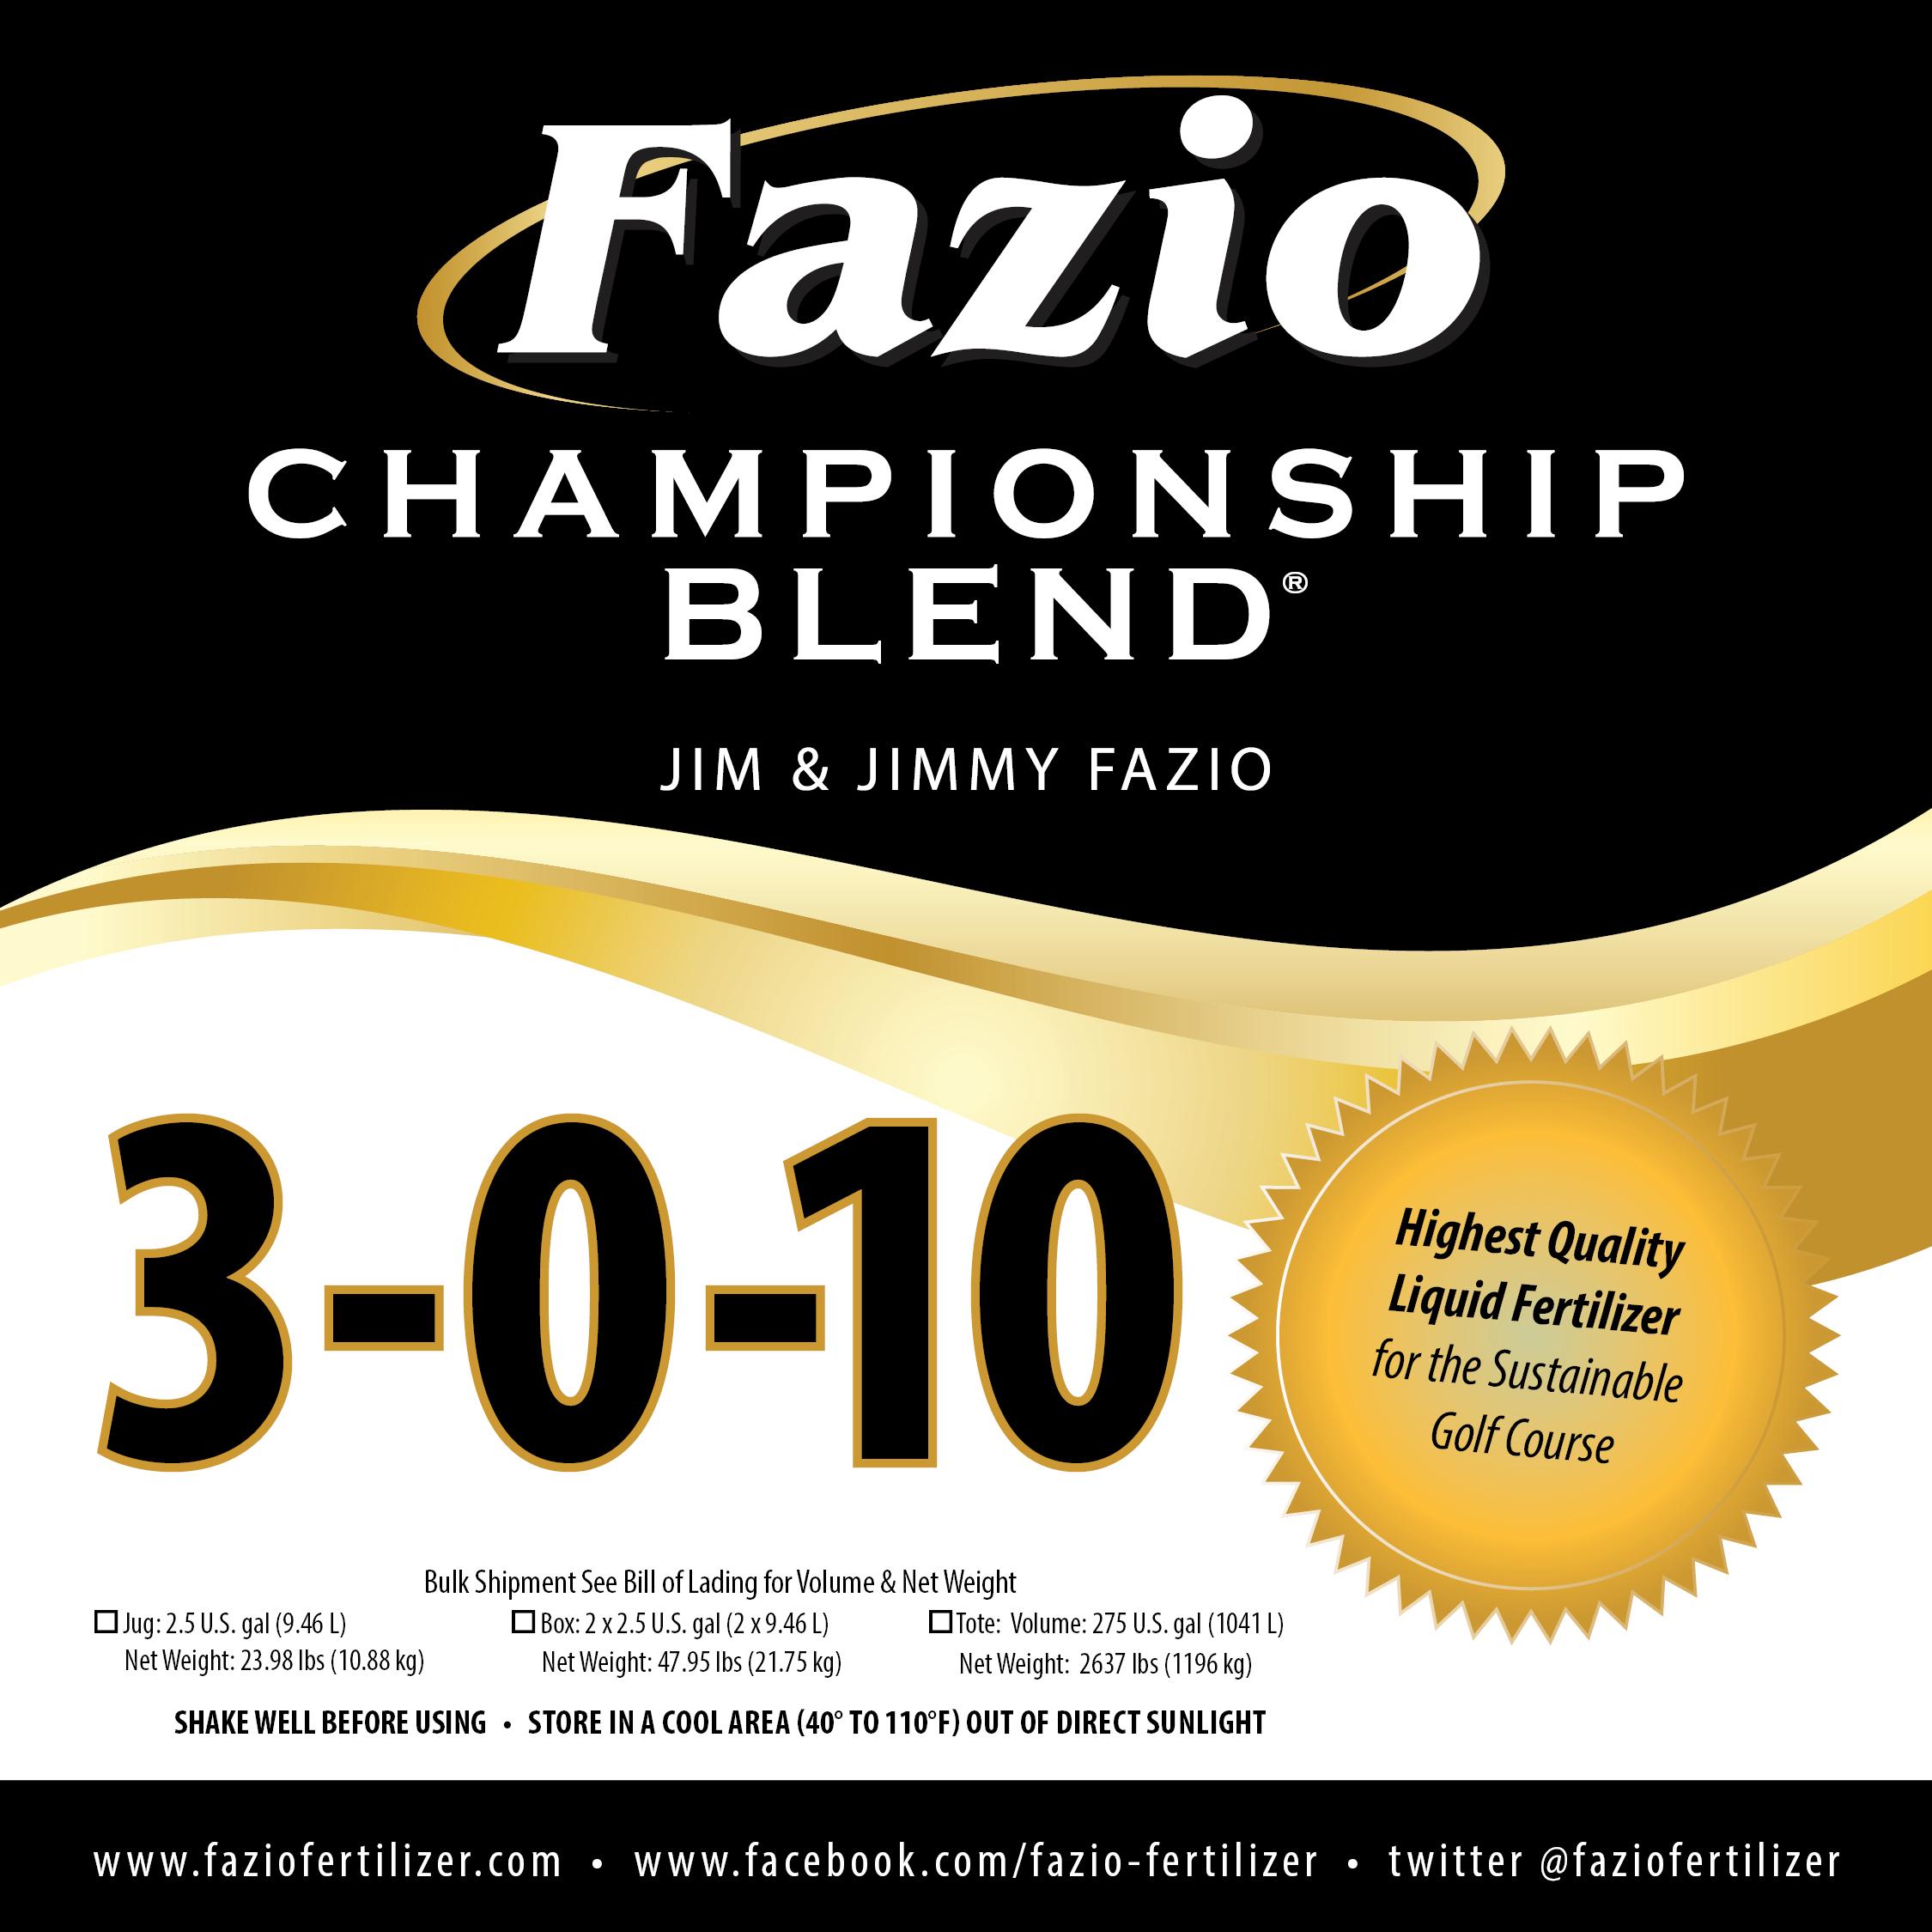 Fazio Championship Blend 3-0-10